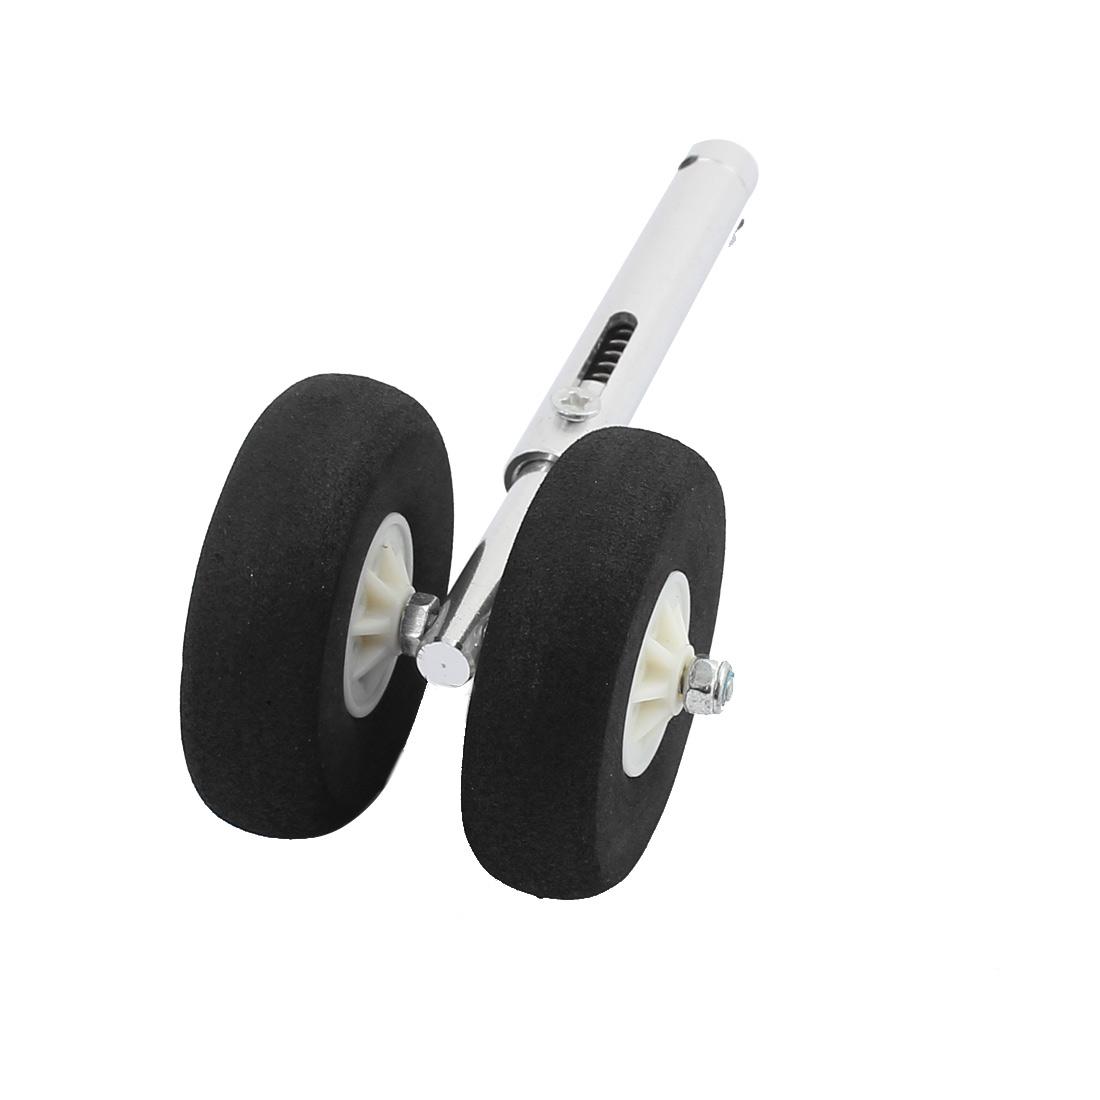 RC Model Plane Servoless Retractable Landing Gears 45mm Sponge Wheel